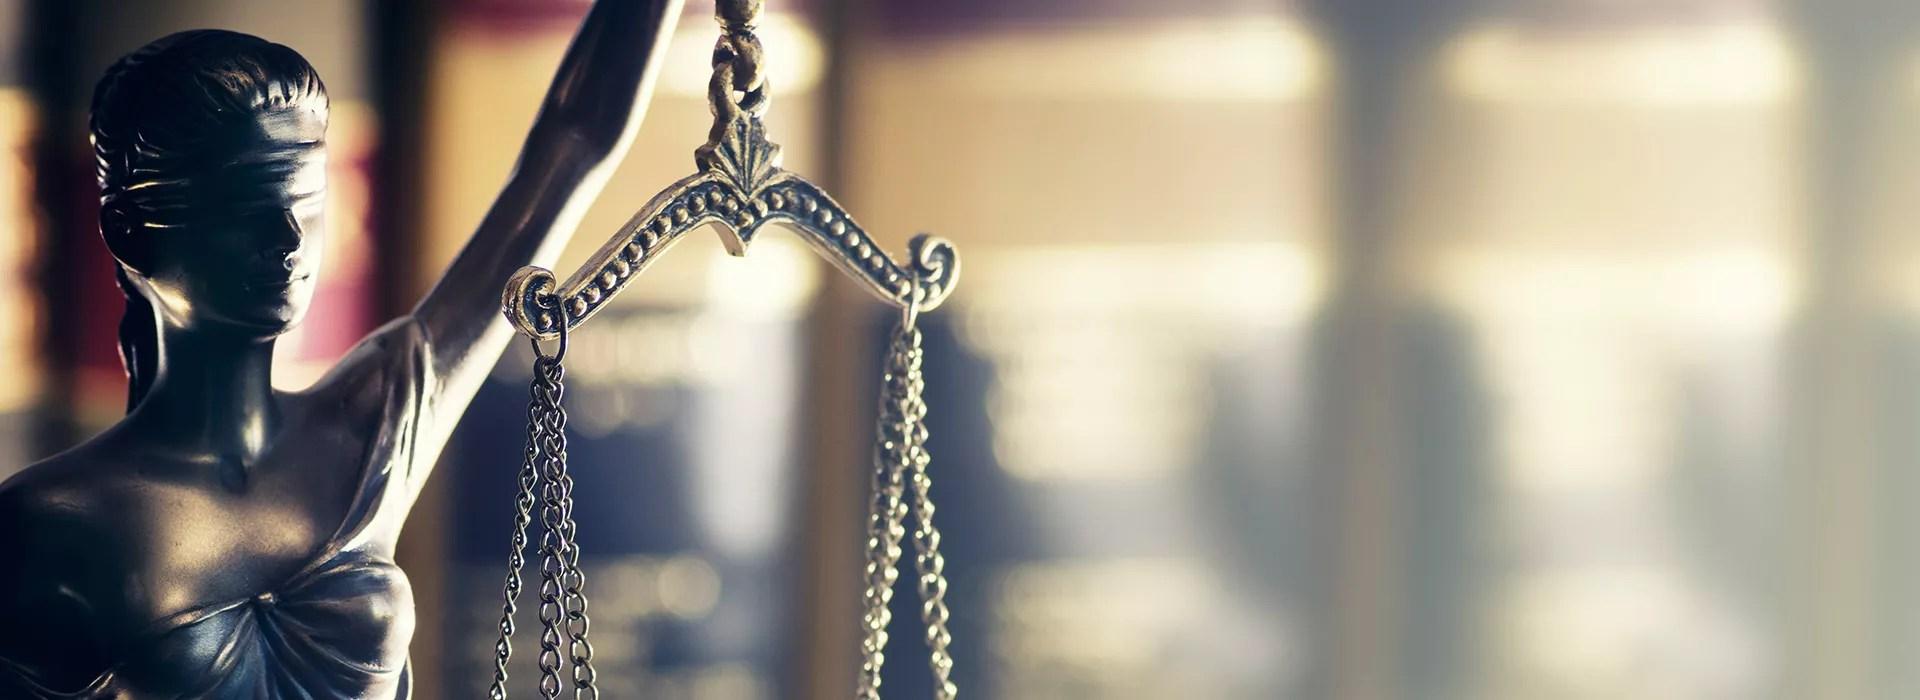 Lamothe Mass Tort Attorney